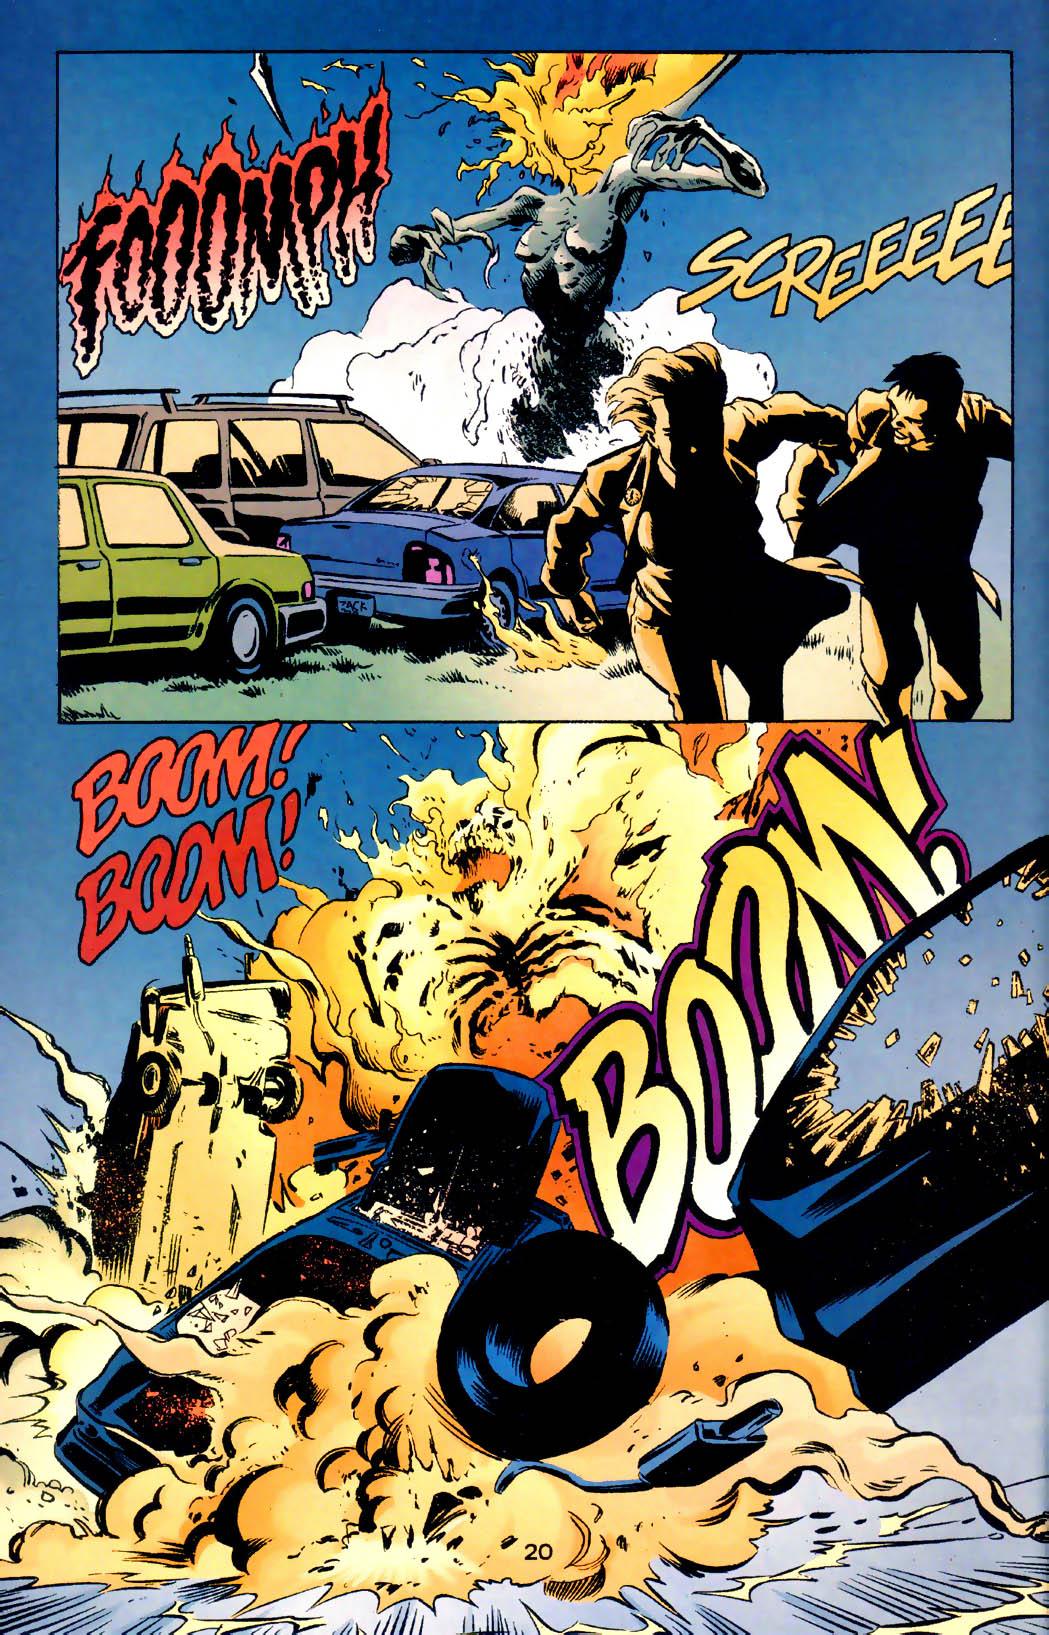 Read online Midnight, Mass comic -  Issue #5 - 21